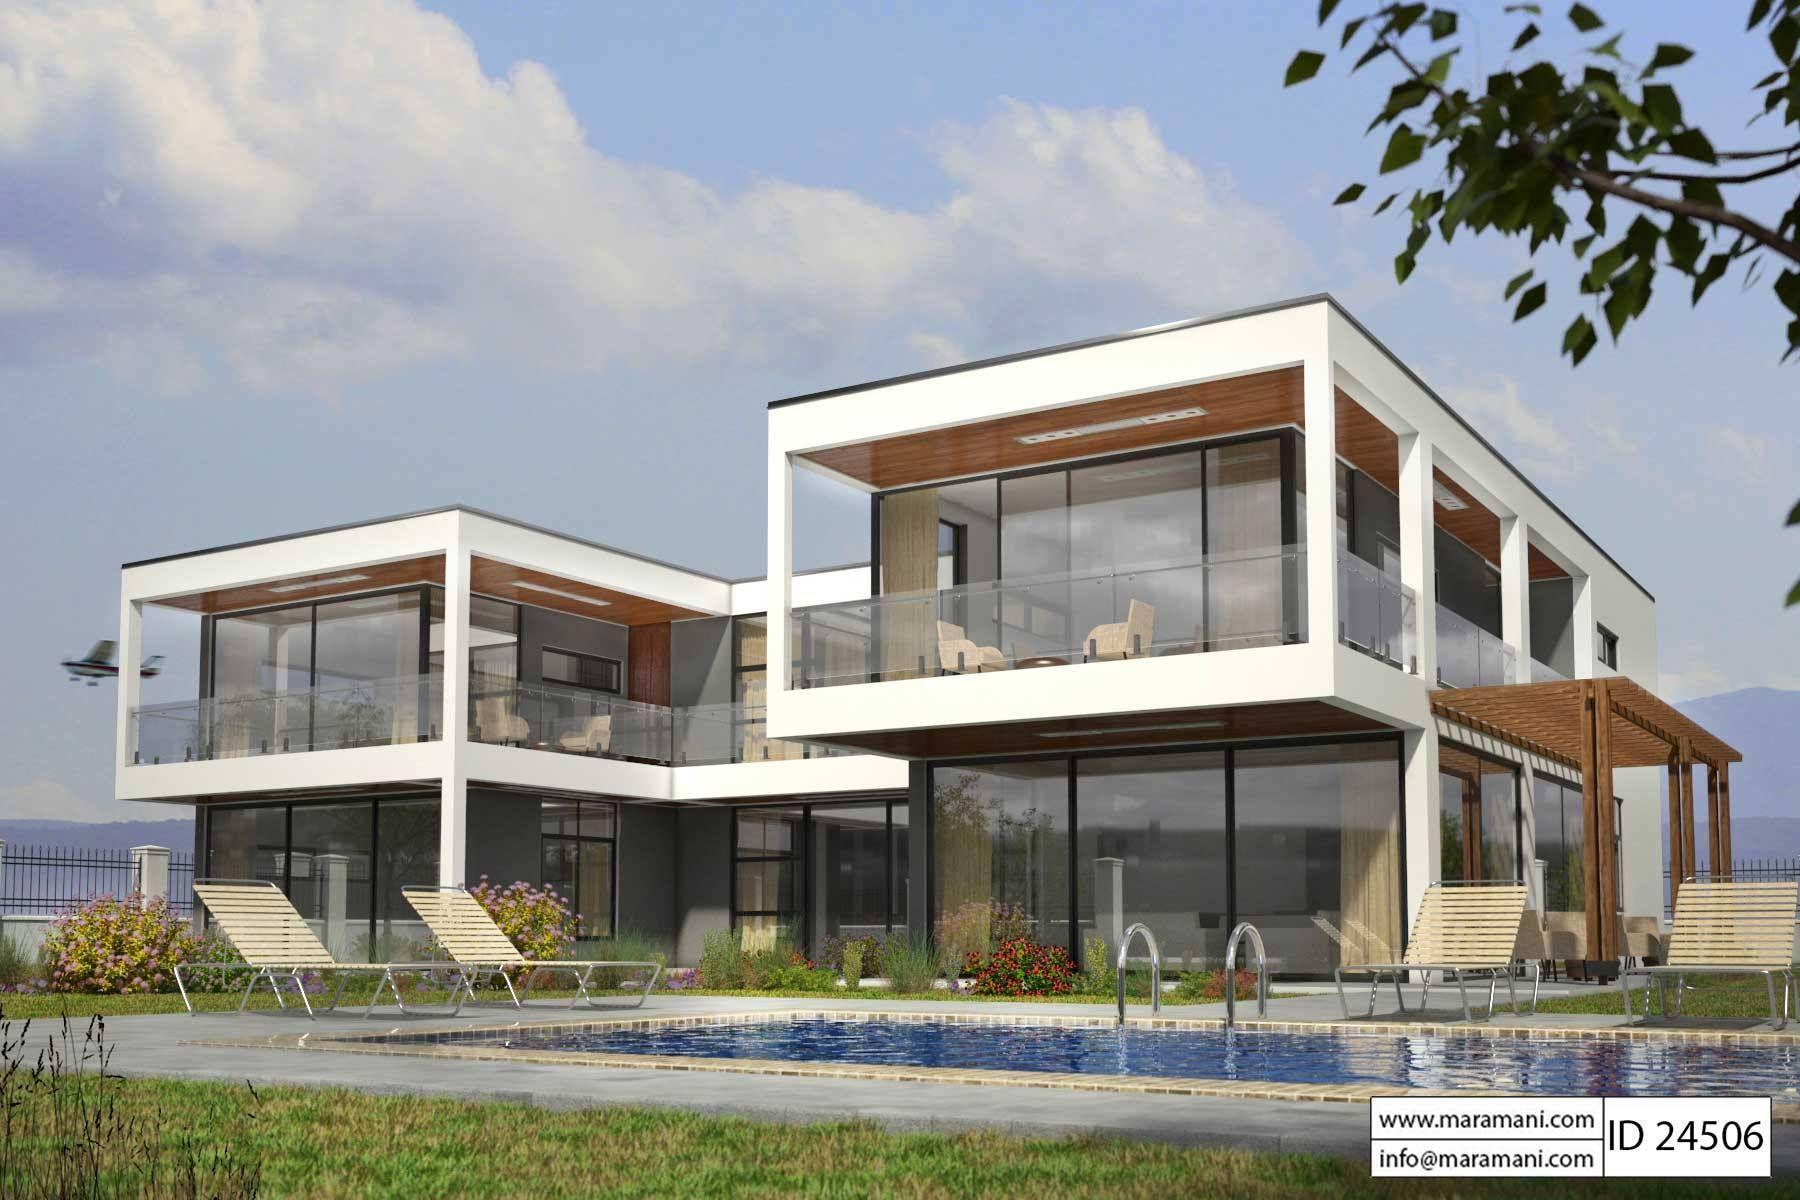 4 Bedroom House Plan Id 24506 Modern Glass House House Plans Glass House Design